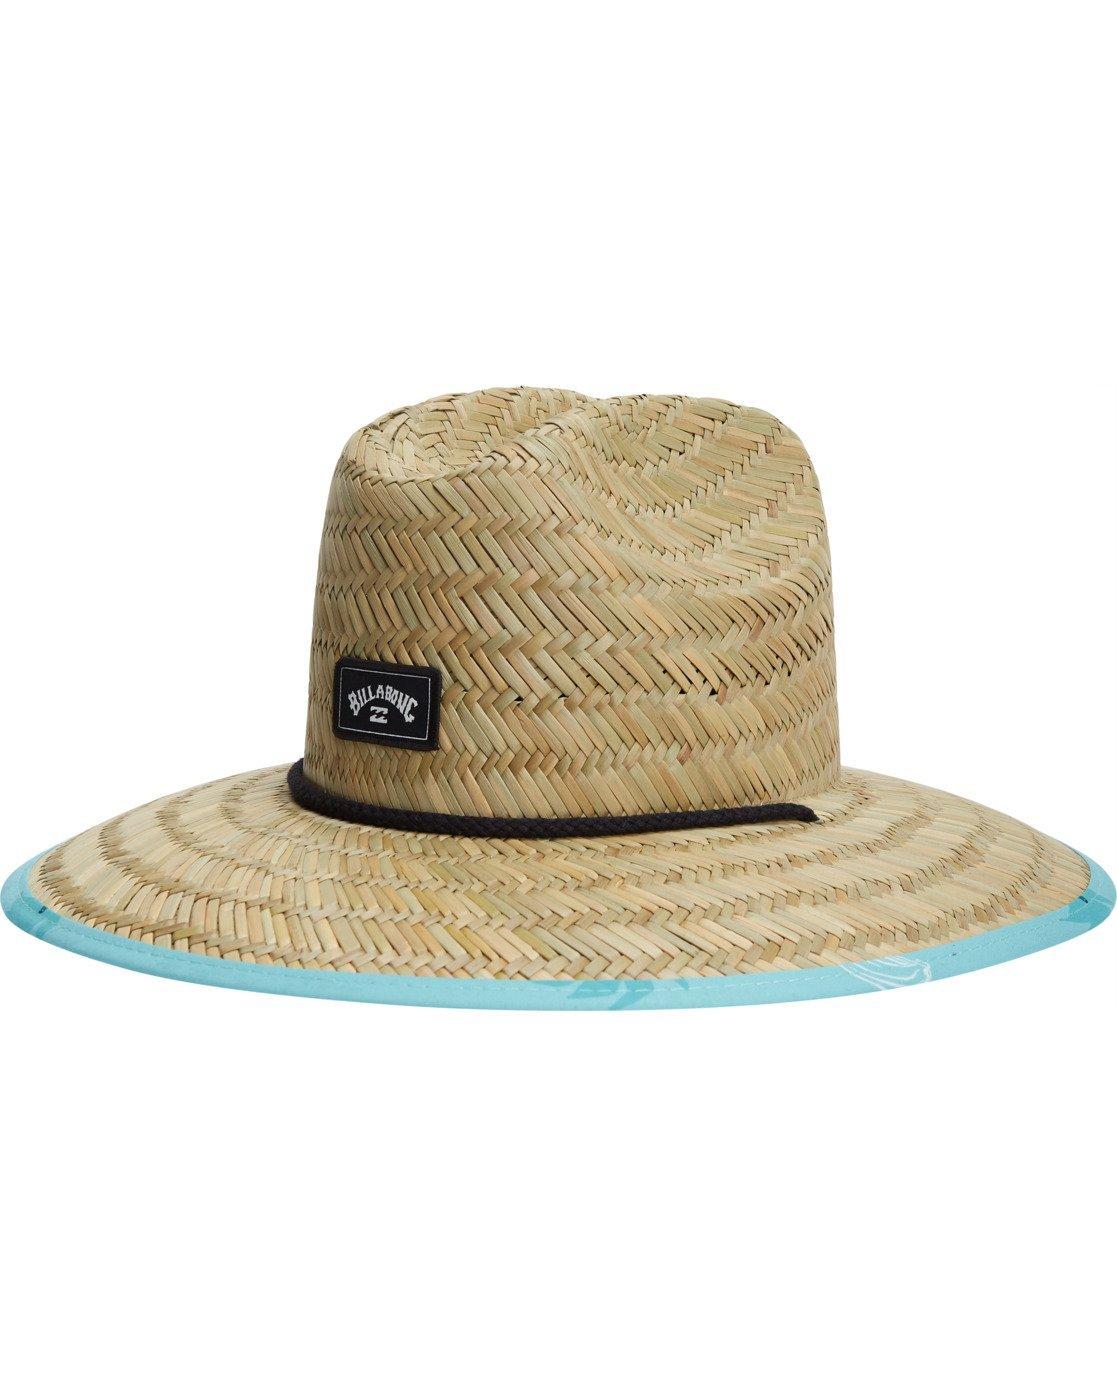 Billabong Boy's Tides Print Hat